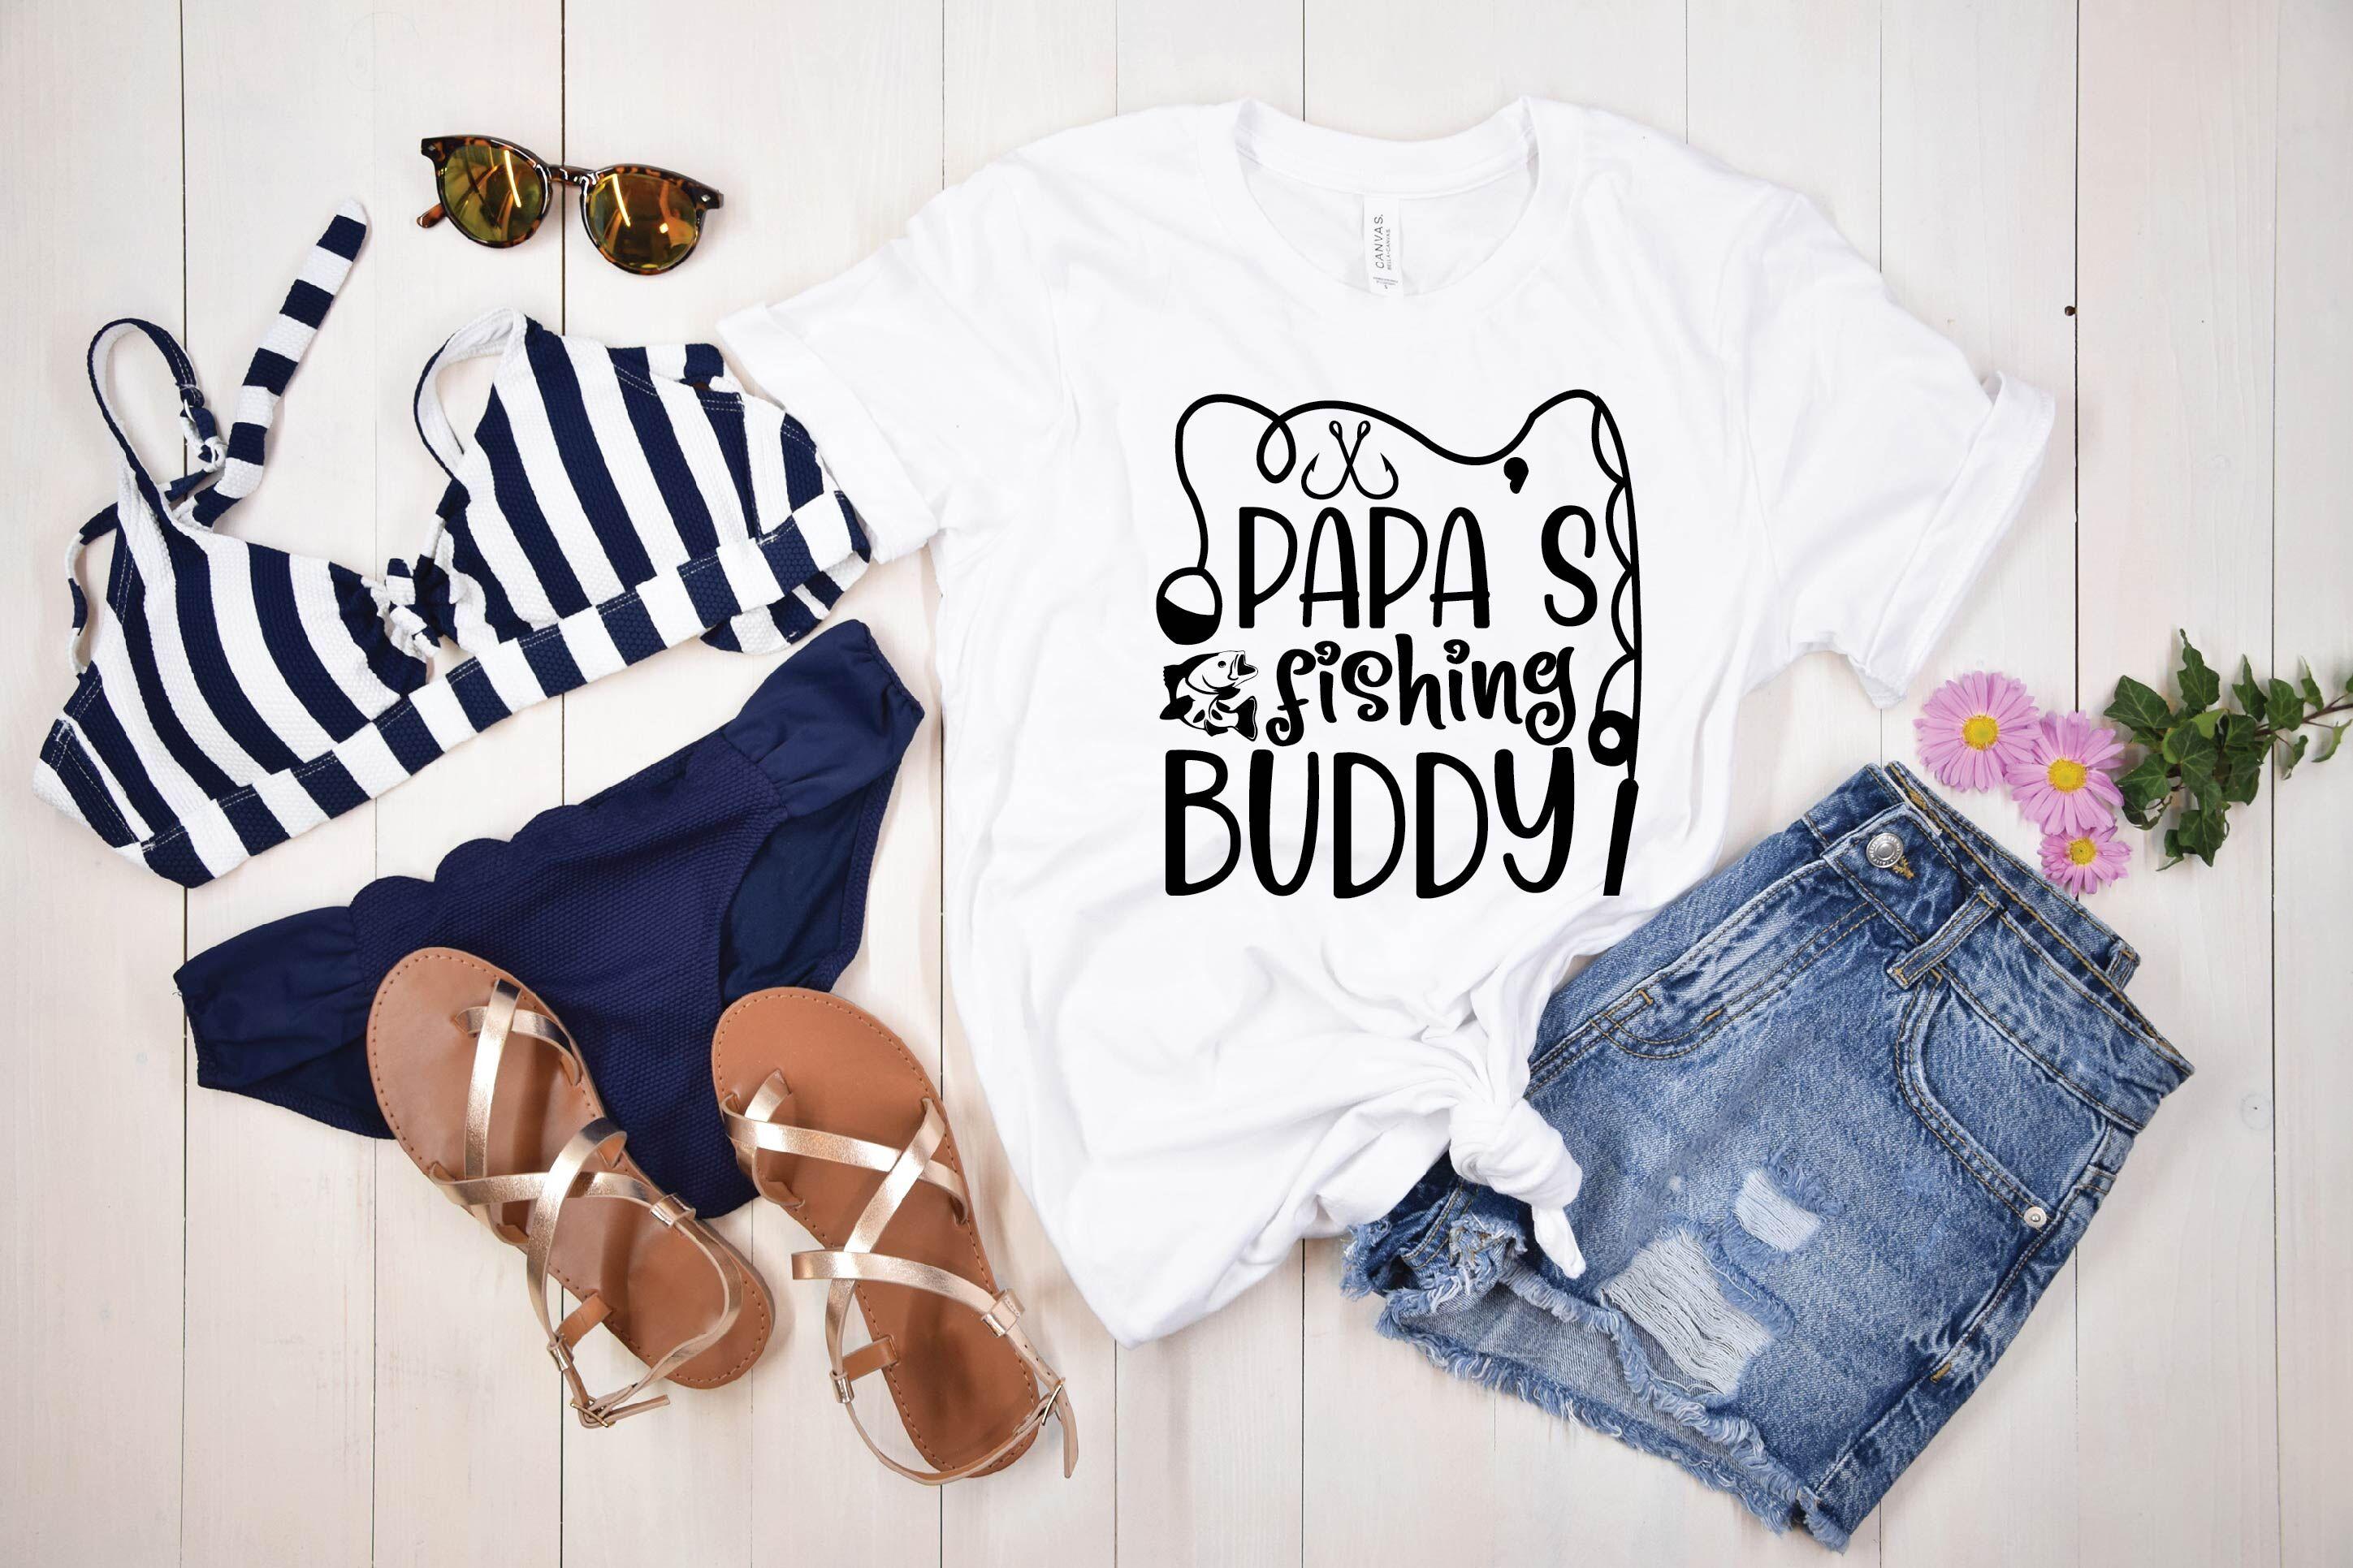 Download Papa S Fishing Buddy Svg Design By Bdb Graphics Thehungryjpeg Com